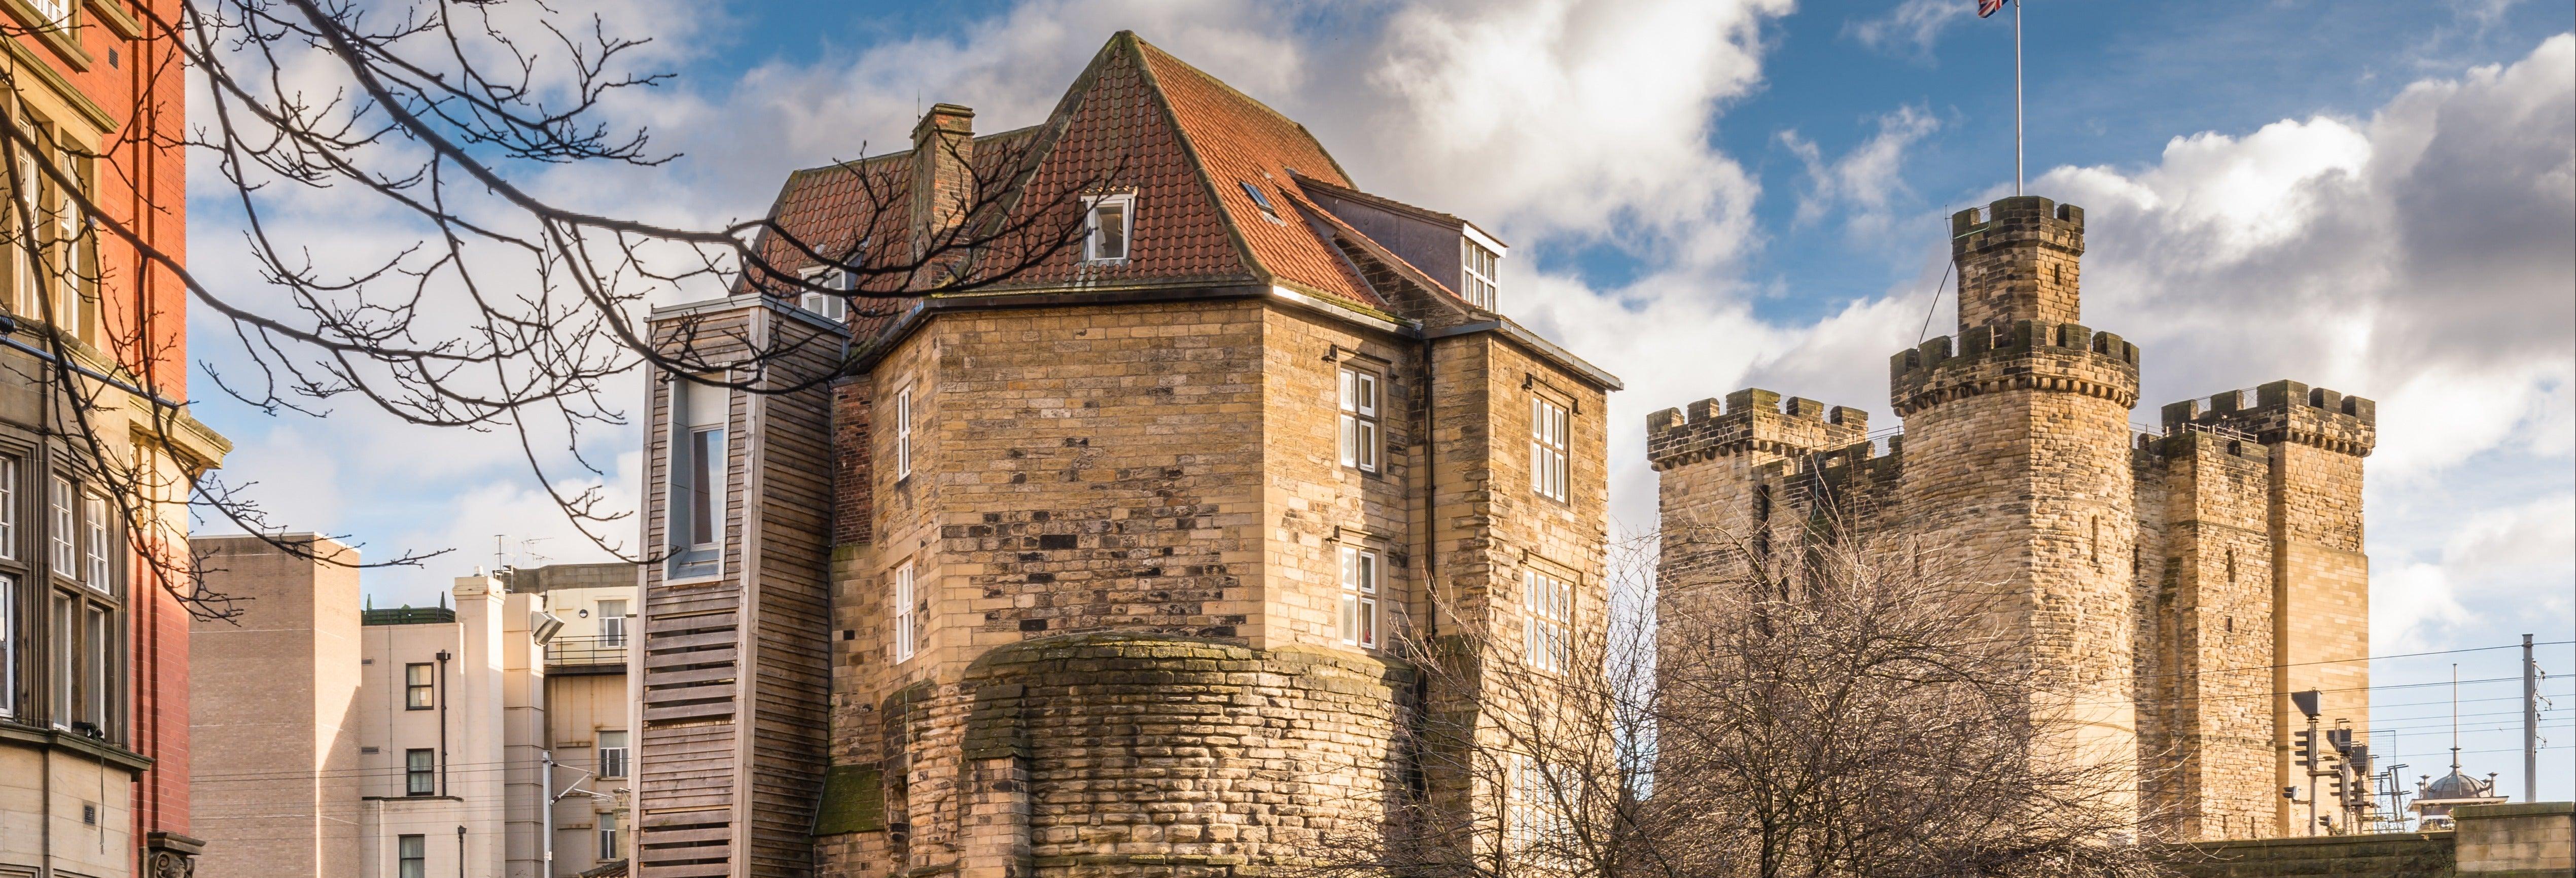 Entrada al Castillo de Newcastle